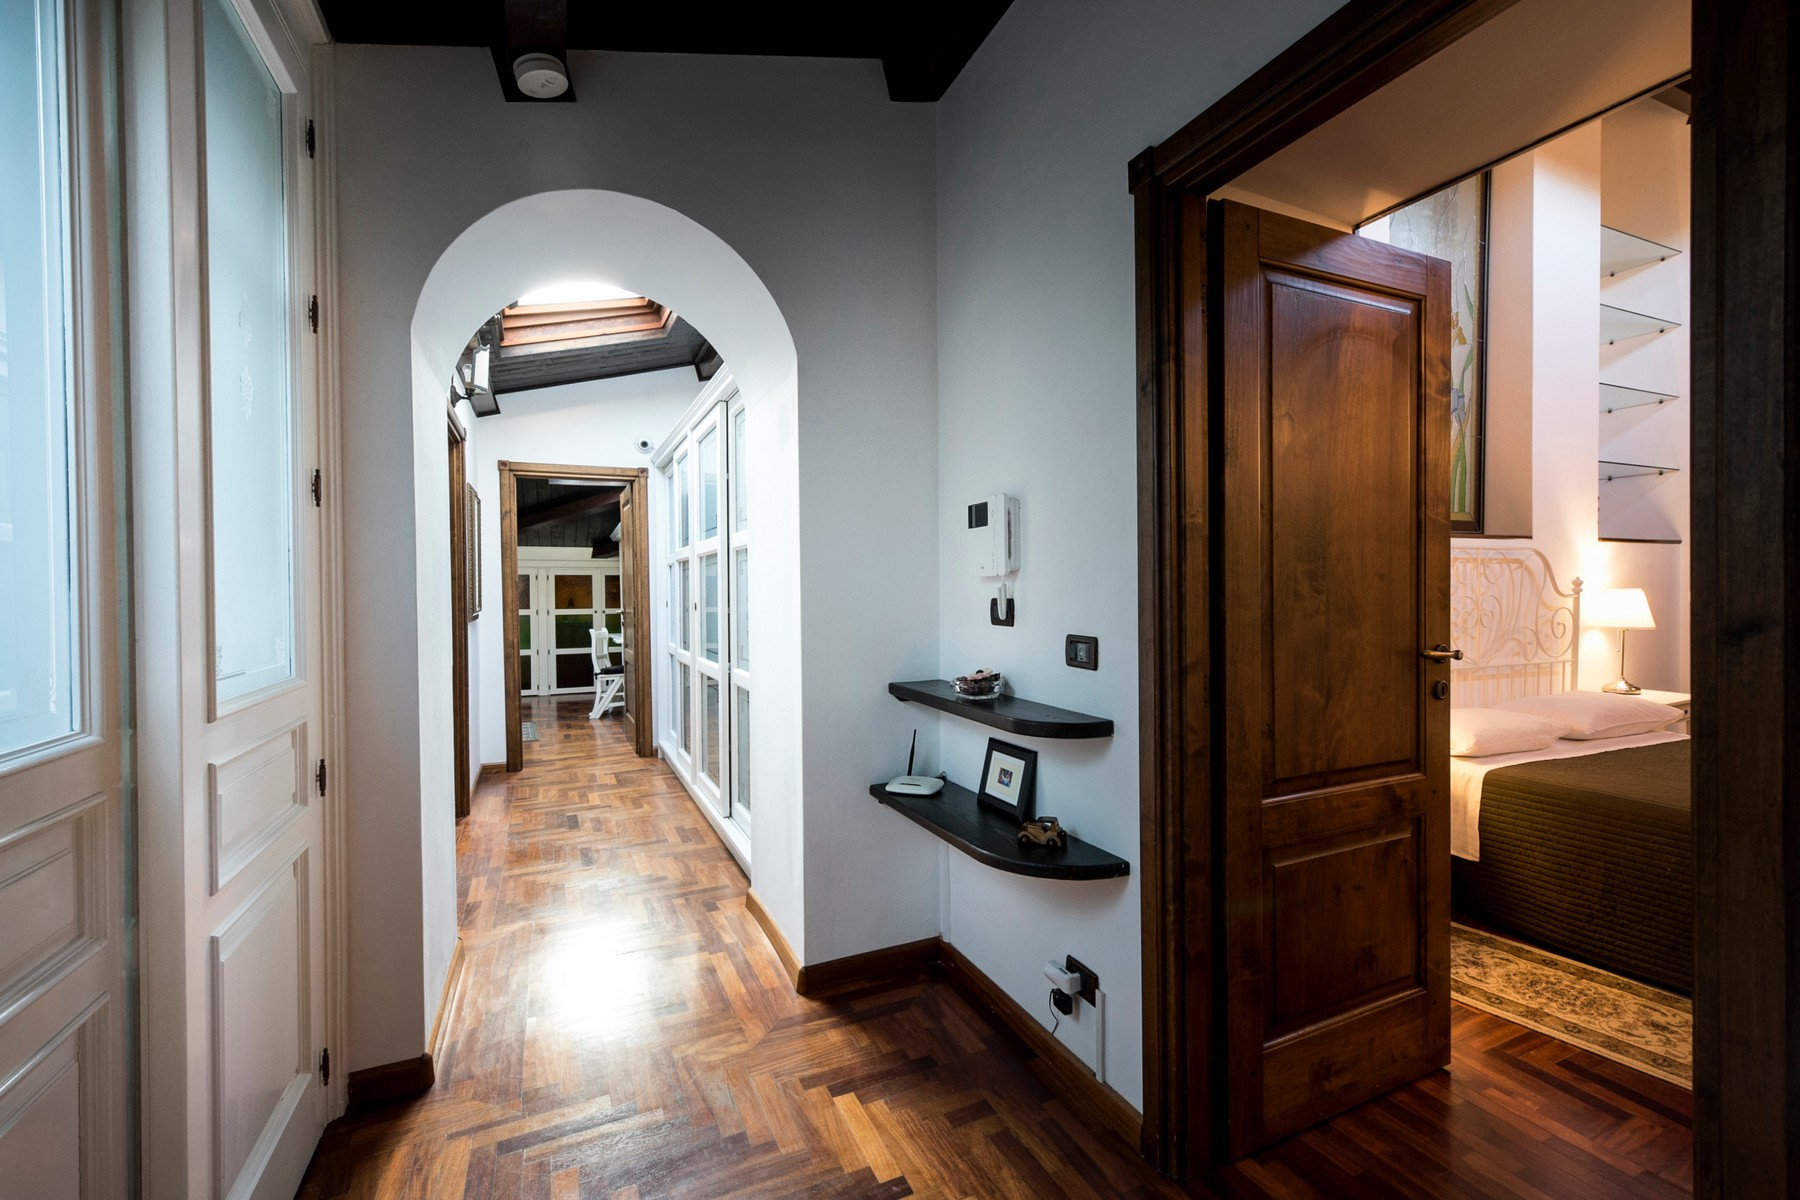 Casa indipendente in Vendita a Noto: 5 locali, 300 mq - Foto 23